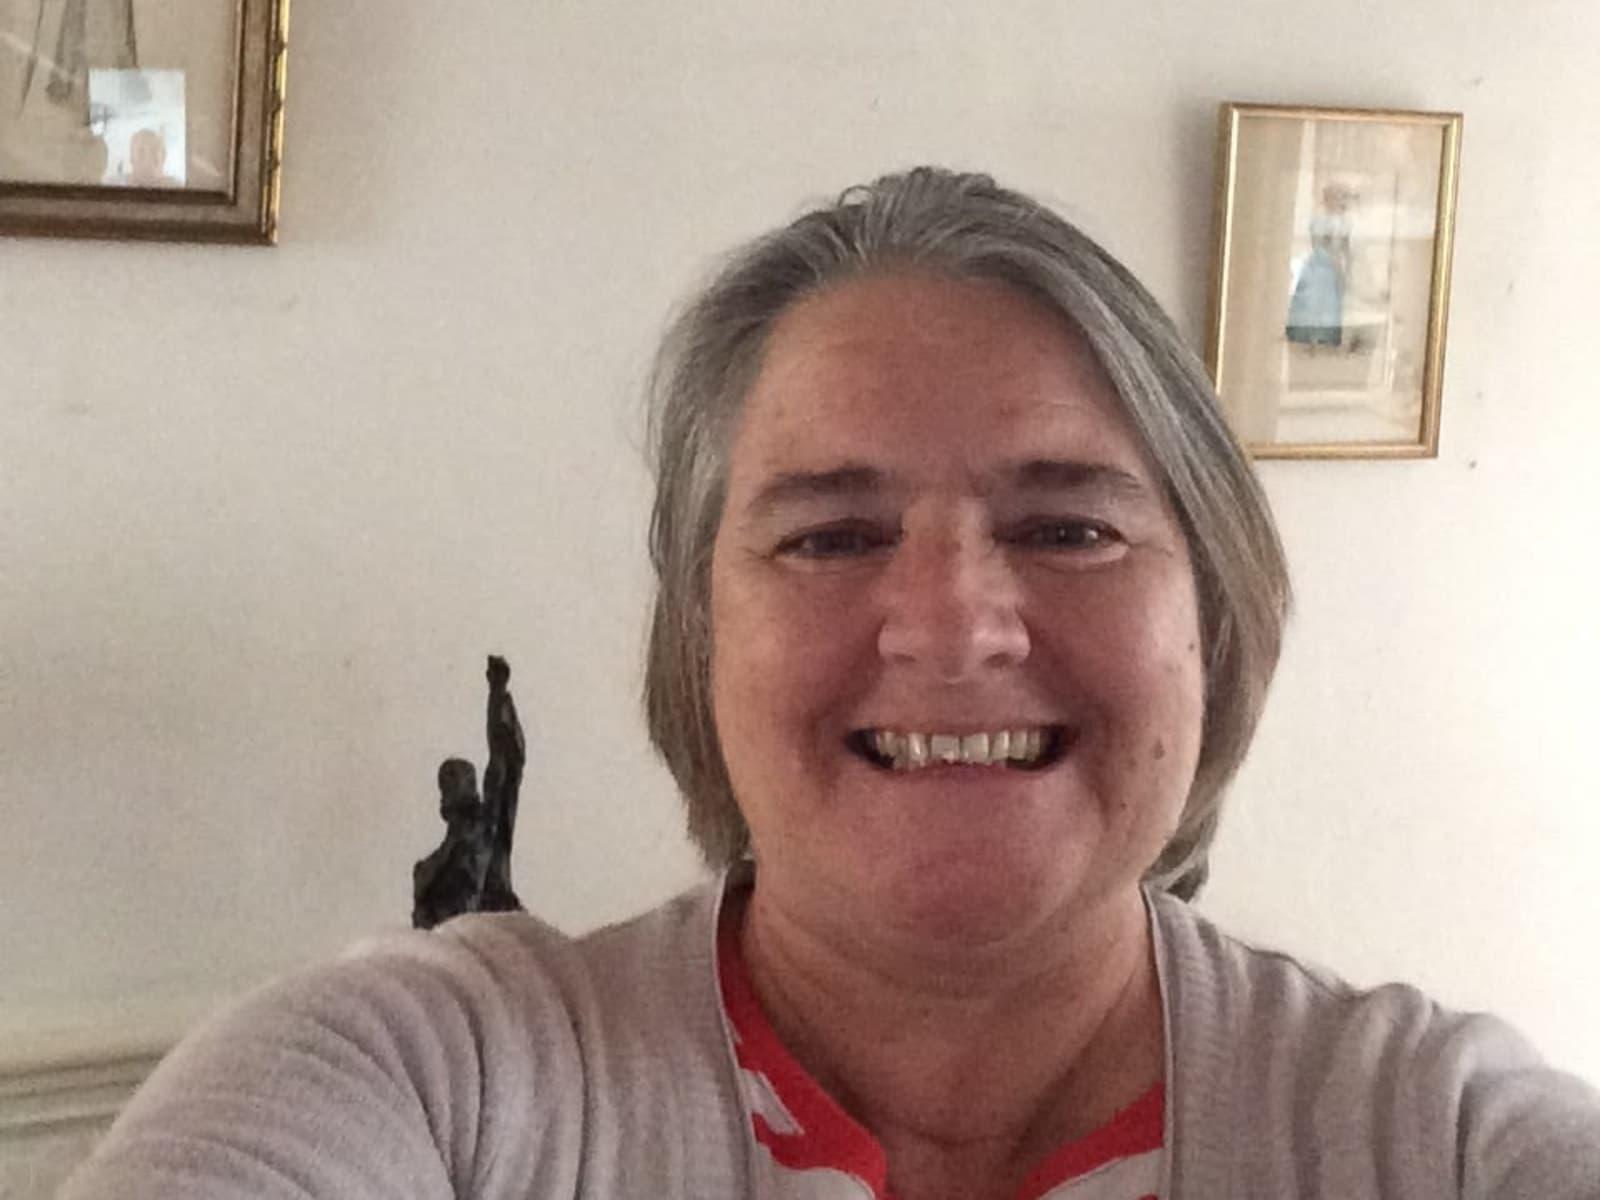 Penelope from Bath, United Kingdom